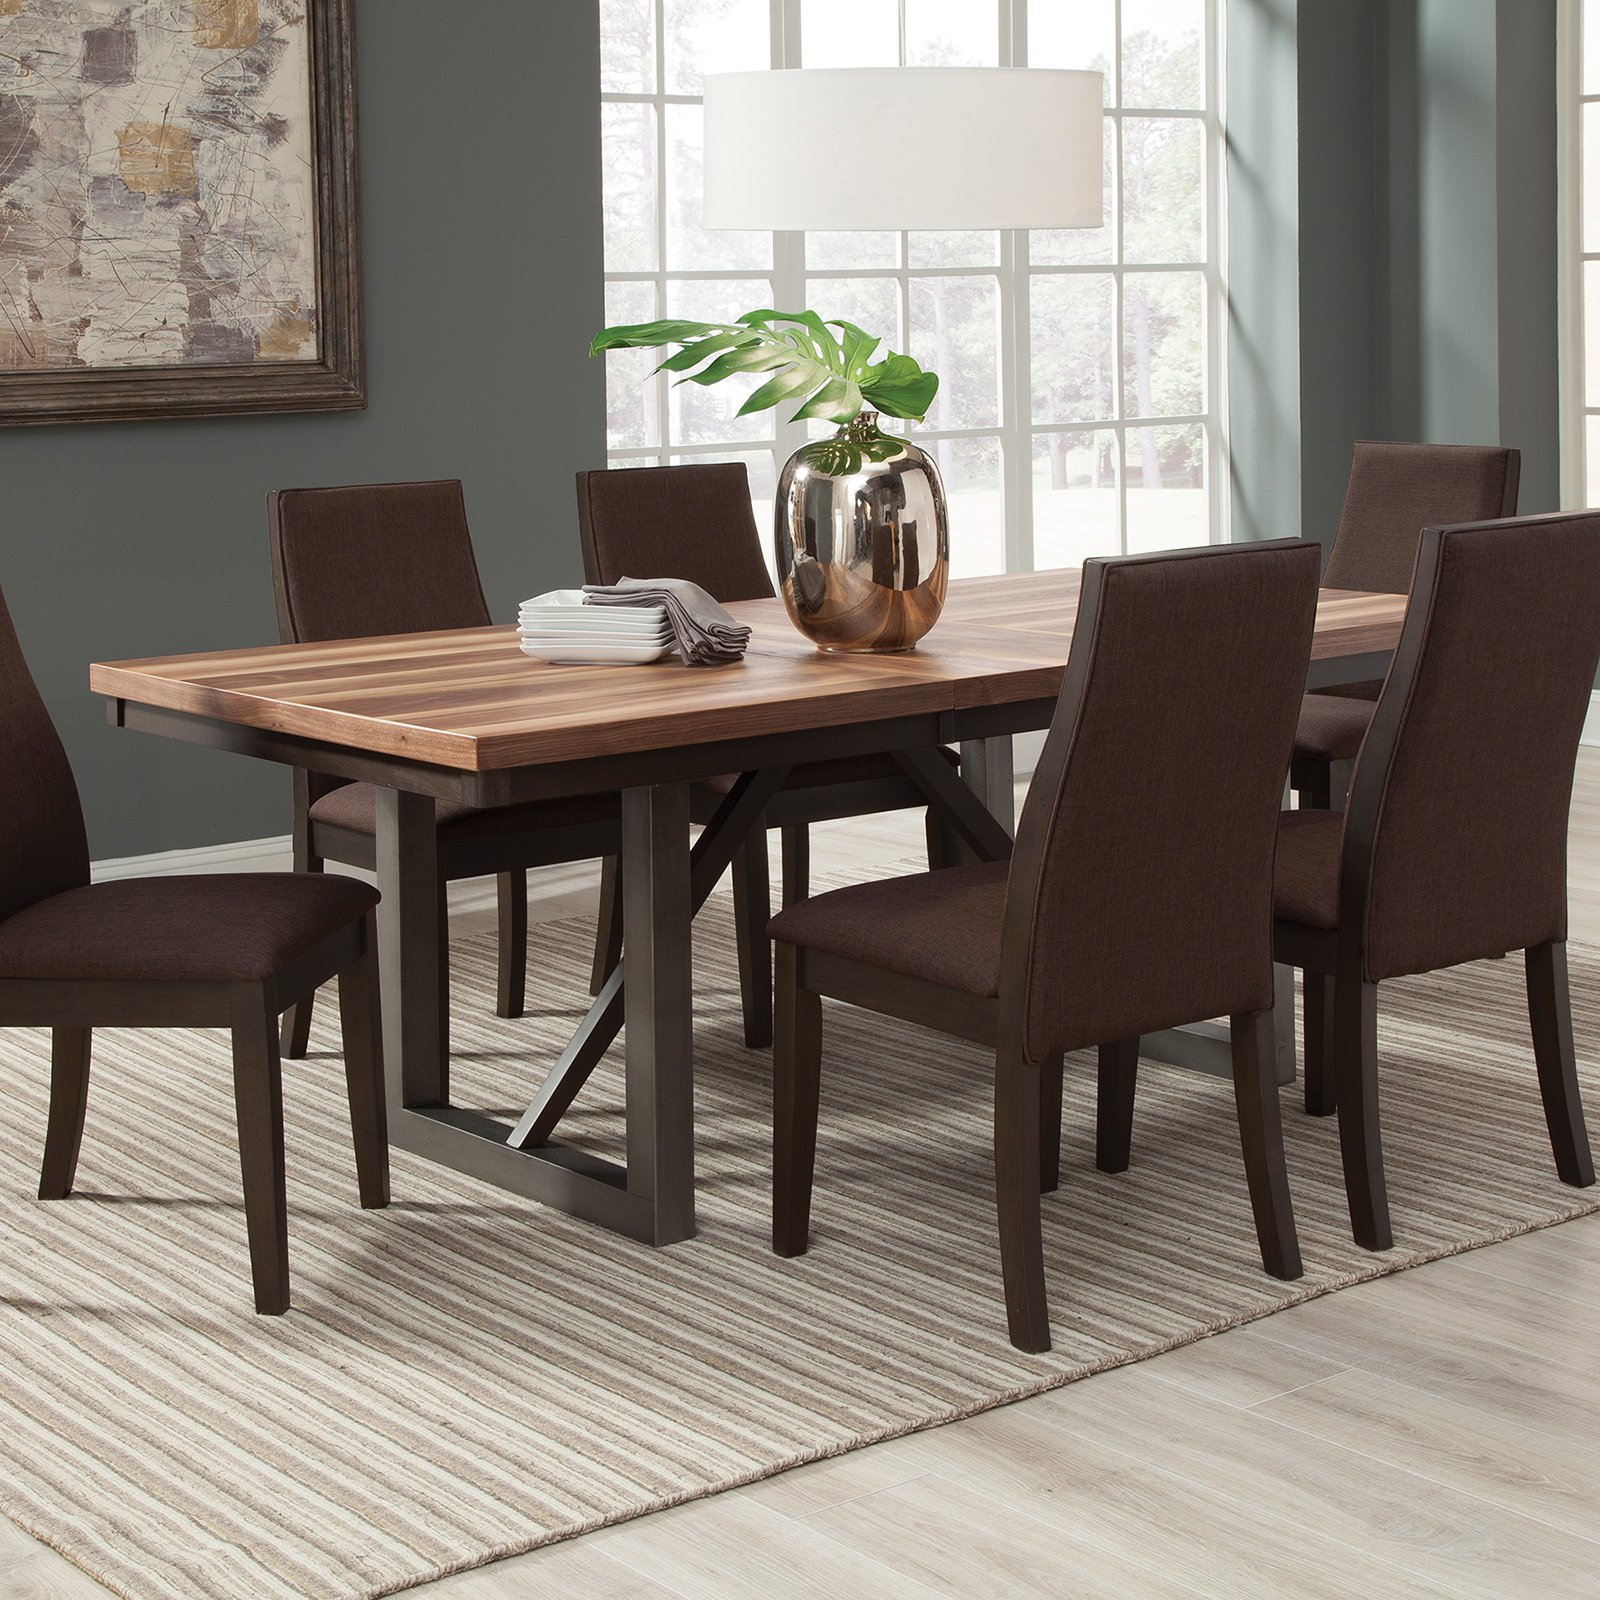 Walmart Table: Coaster Furniture Spring Creek Dining Table